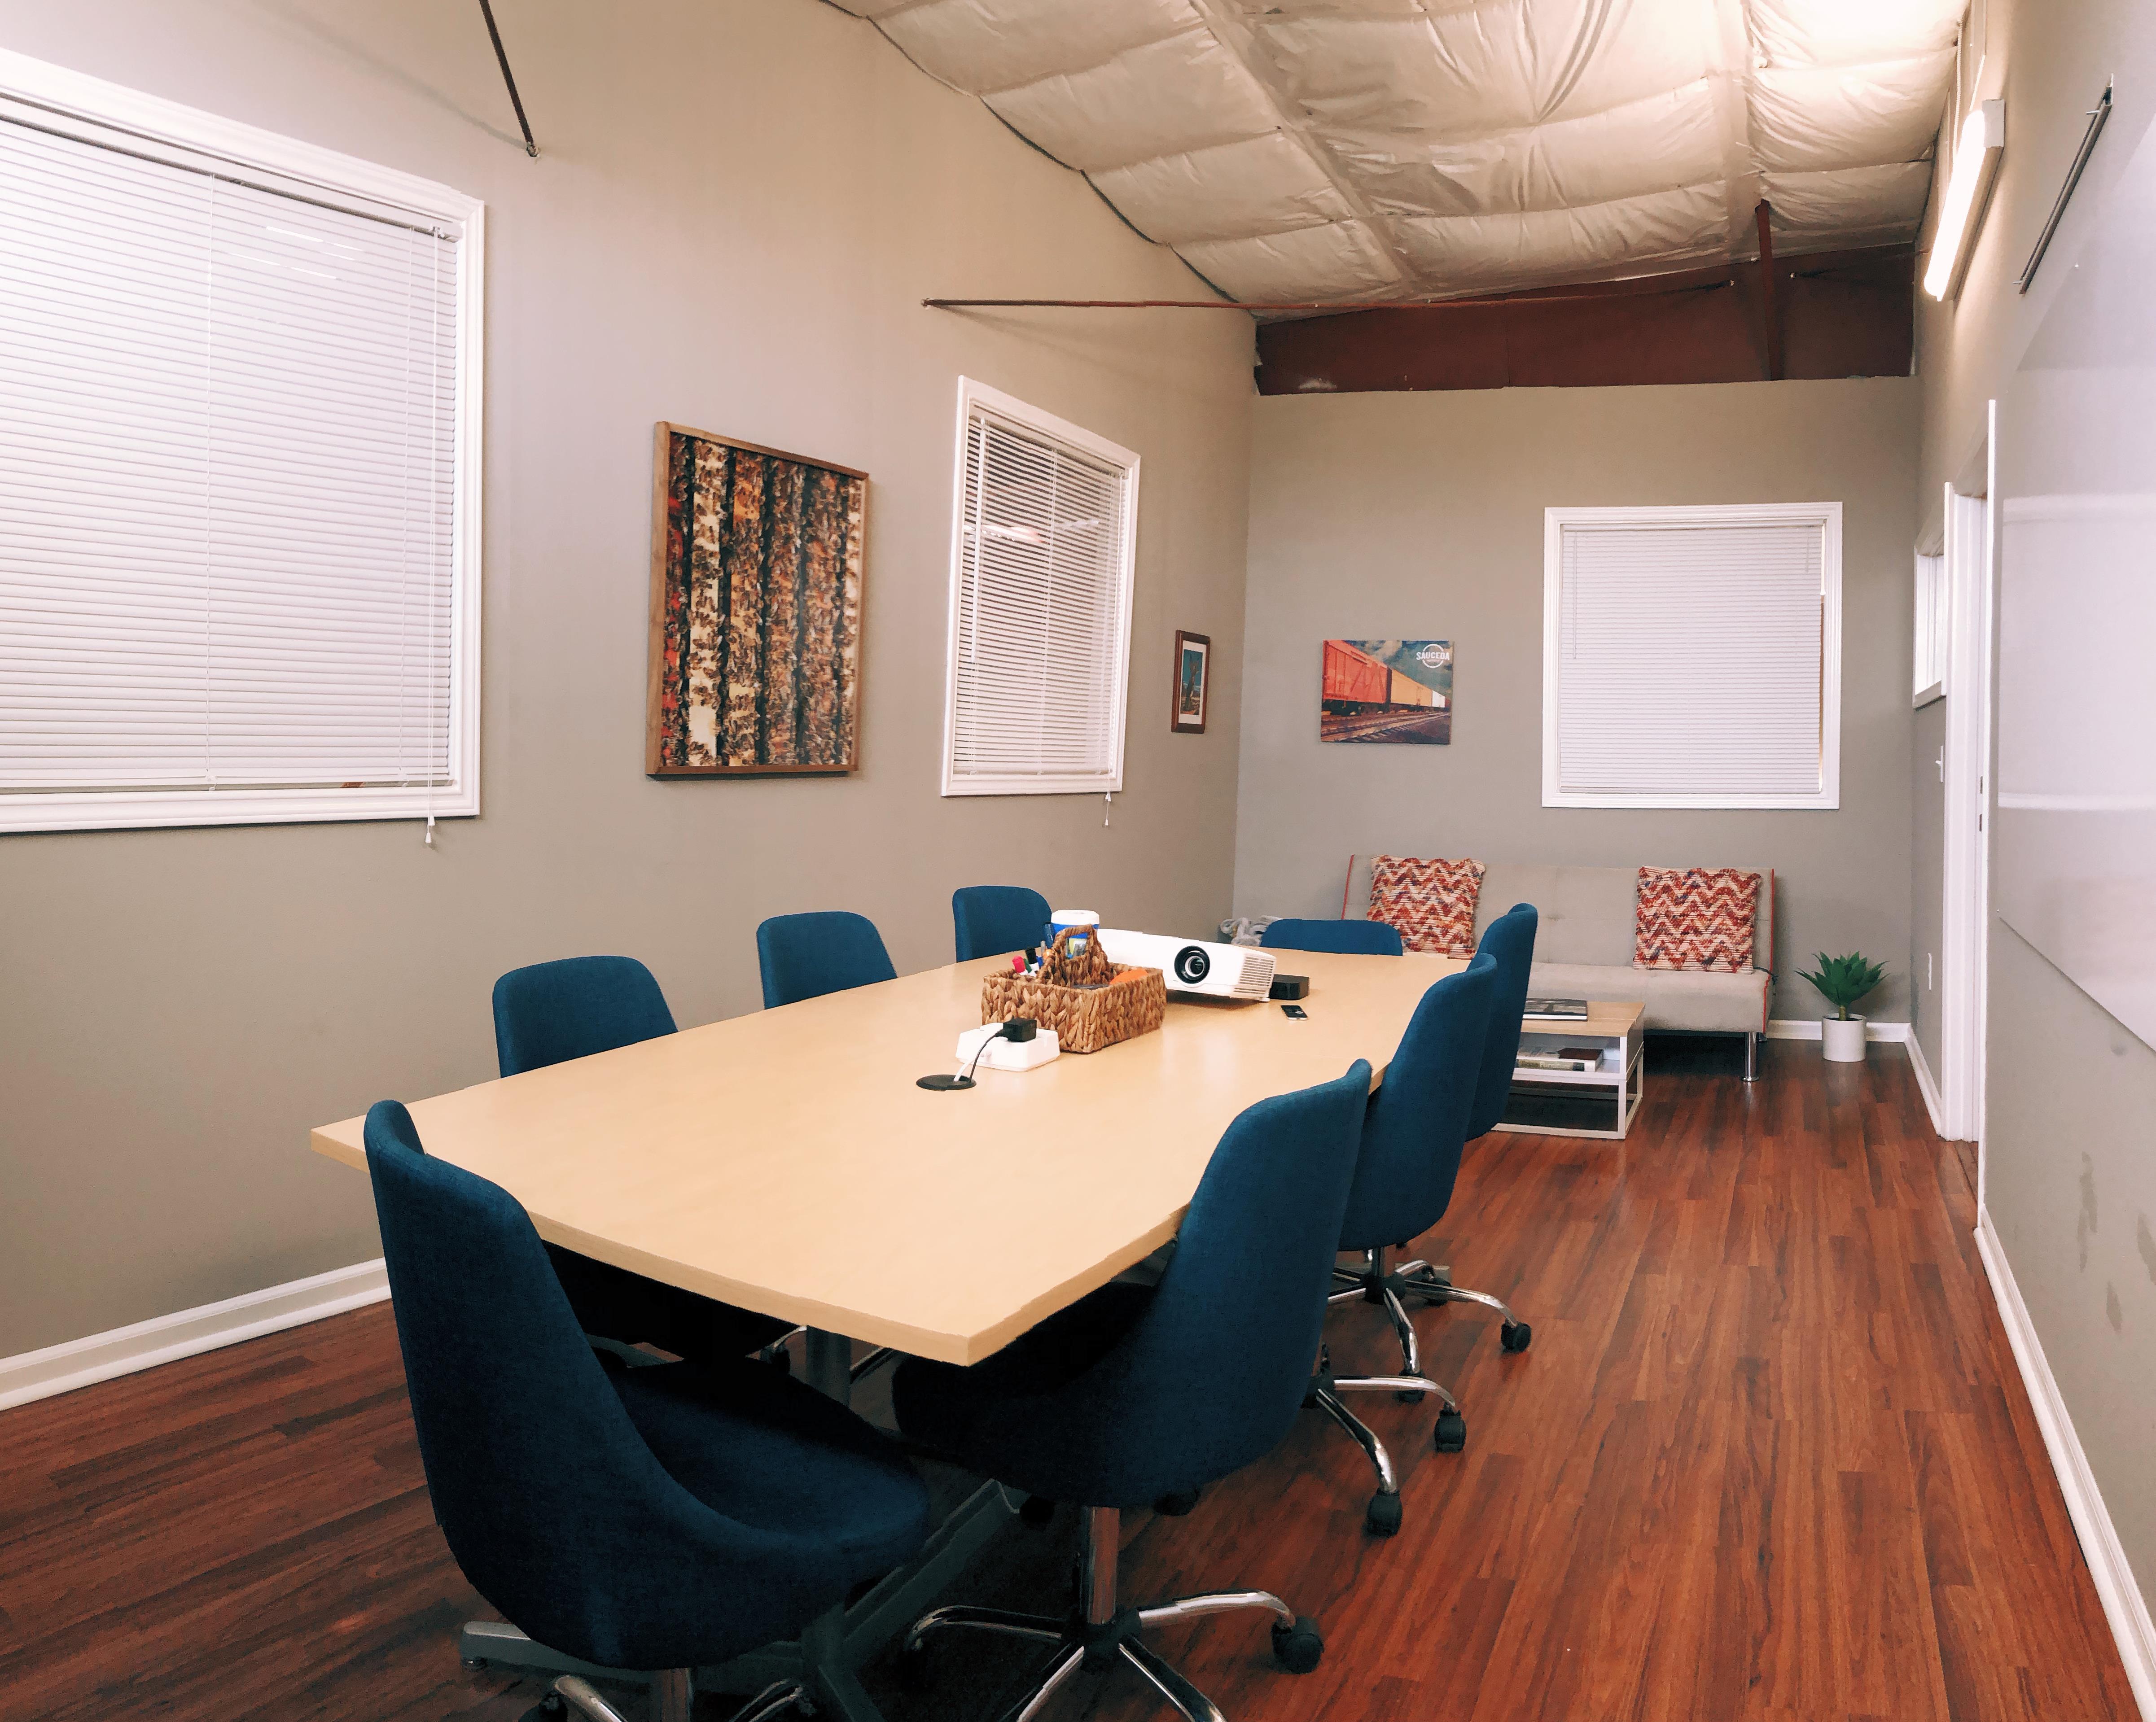 Texas Humor - Meeting Room 1